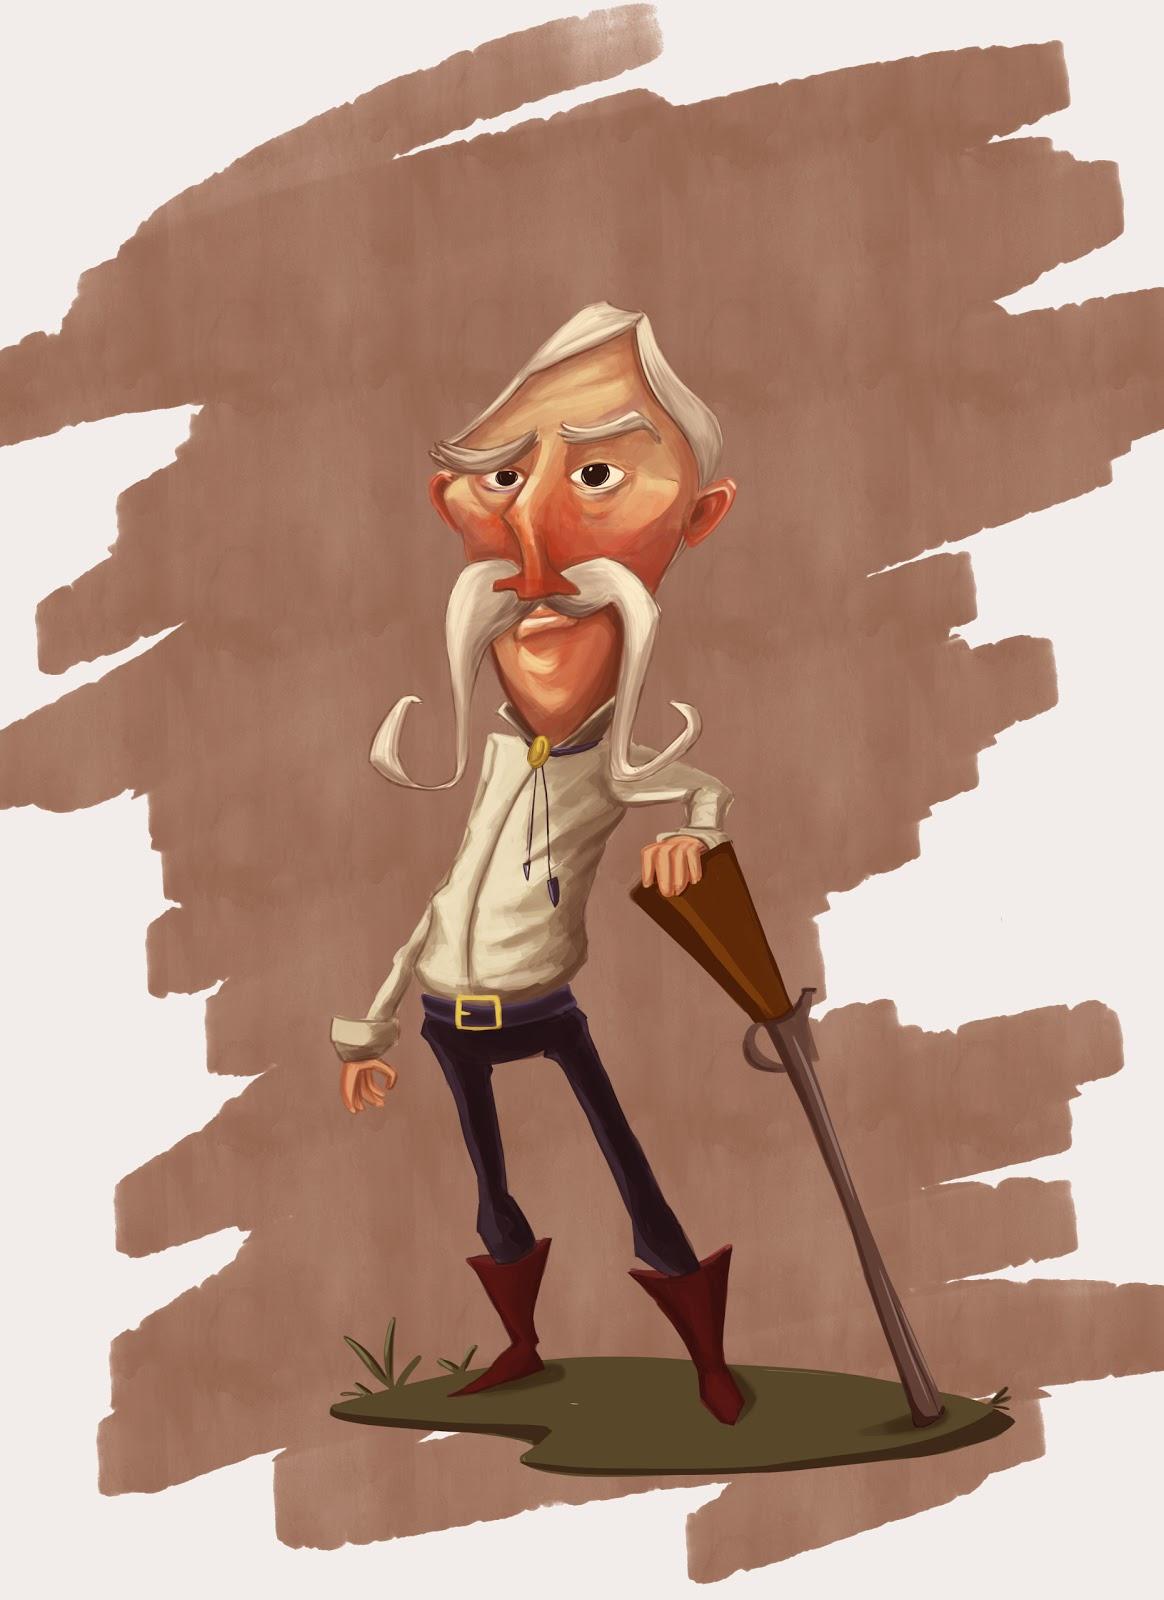 Character Design Old Man : Art of khan old man character design